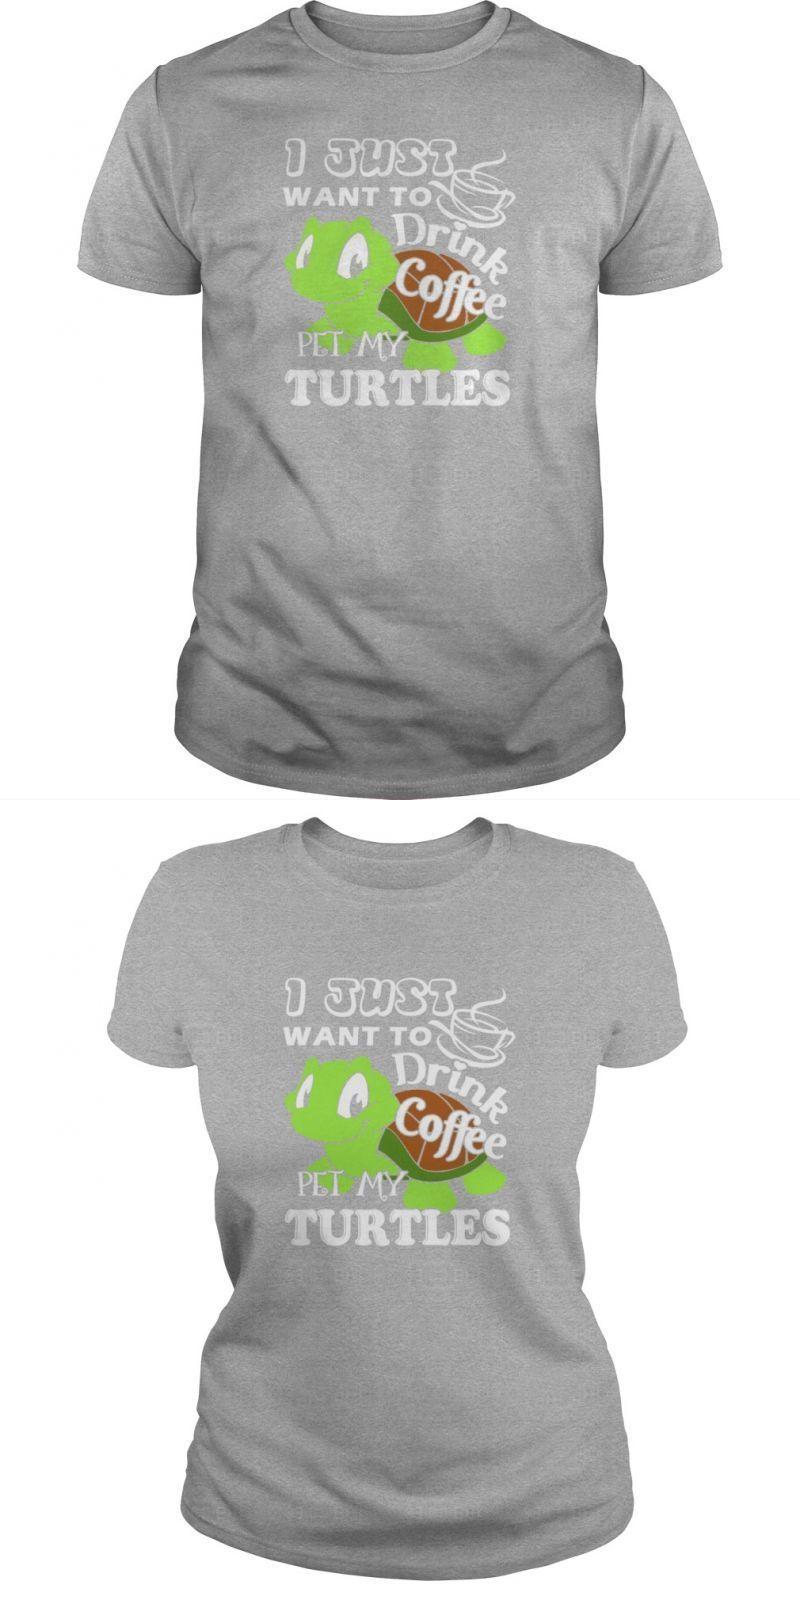 ff460d669 Drink Coffee And Pet My Turtle Shirt Womens Premium Tank Top #hero #turtles  #t-shirt #ninja #turtles #t #shirt #urban #outfitters #ninja #turtles #t # shirt ...